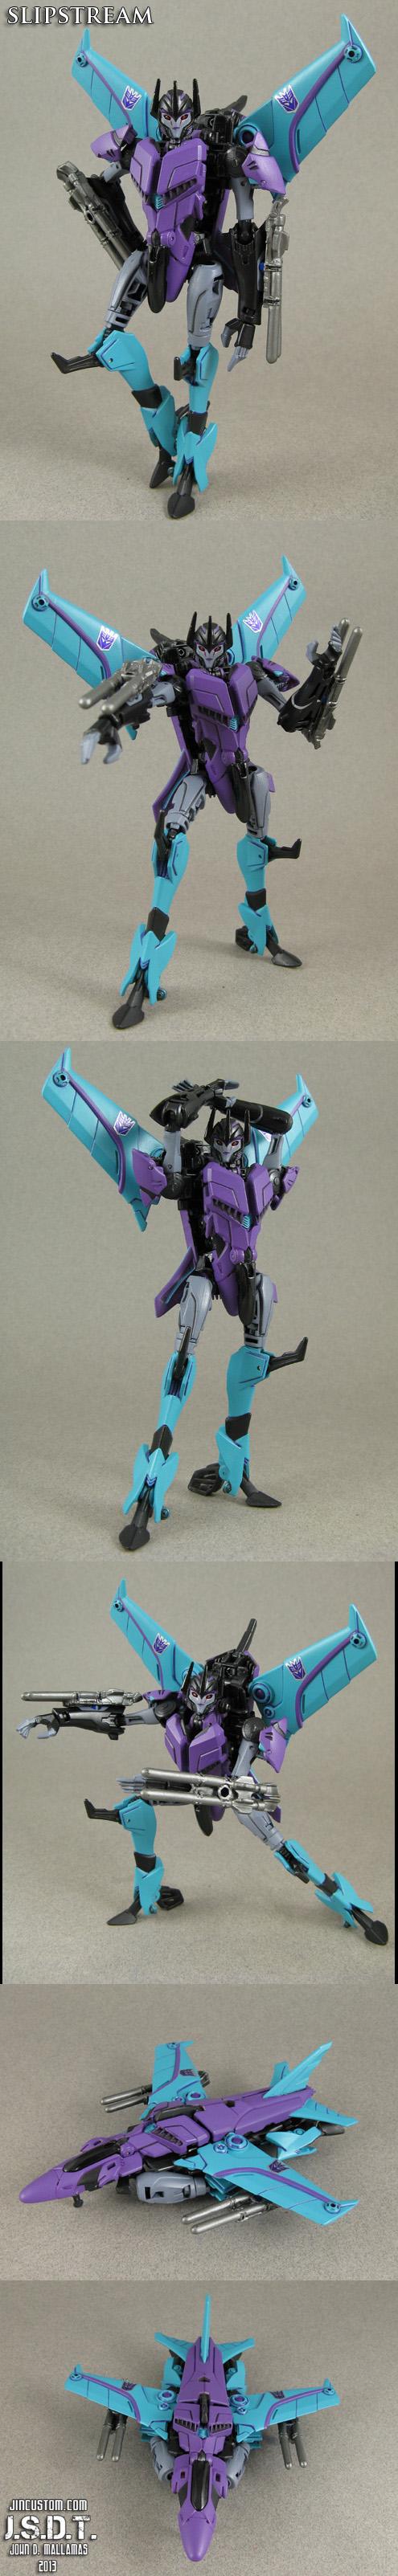 Custom Transformers Prime Slipstream Figure by Jin-Saotome